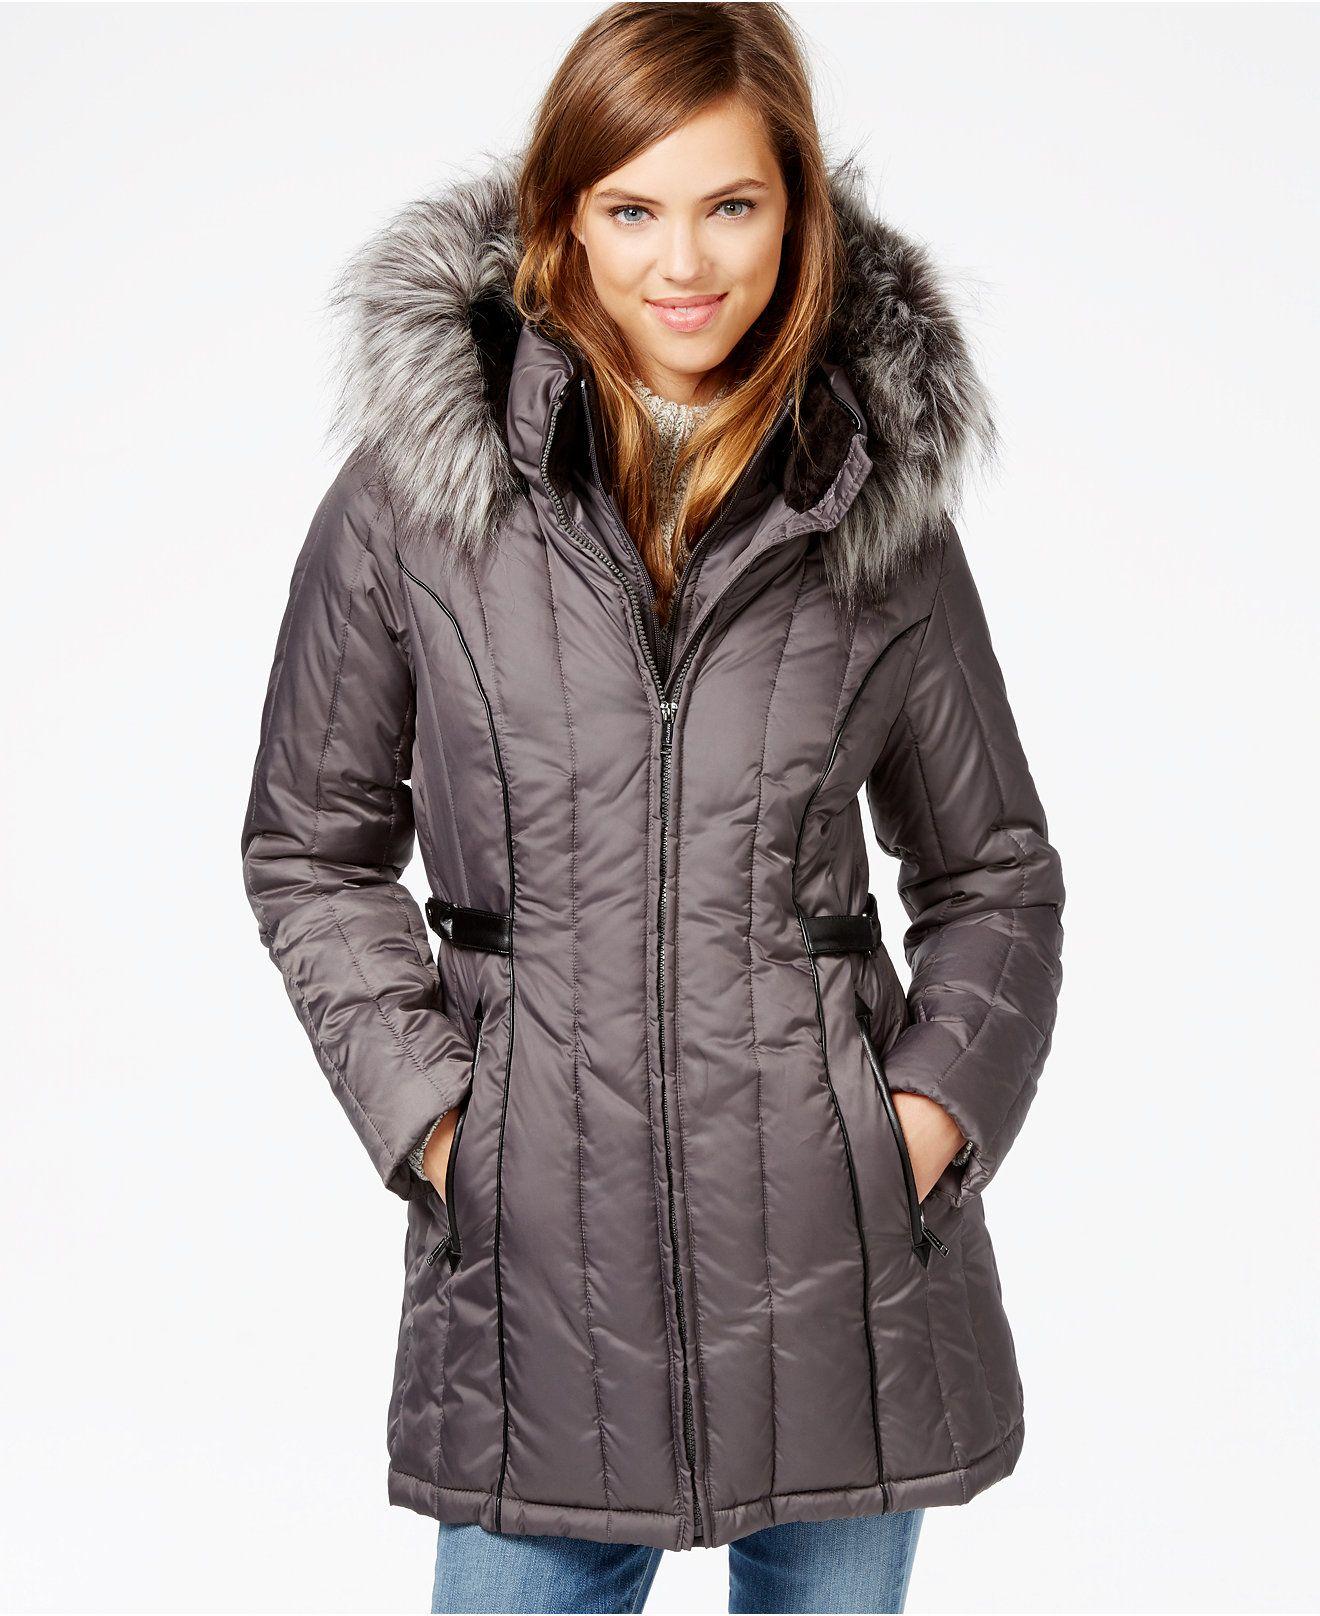 Nautica Faux Fur Trim Hooded Puffer Coat Coats Women Macy S Coats For Women Puffer Coat Coat [ 1616 x 1320 Pixel ]